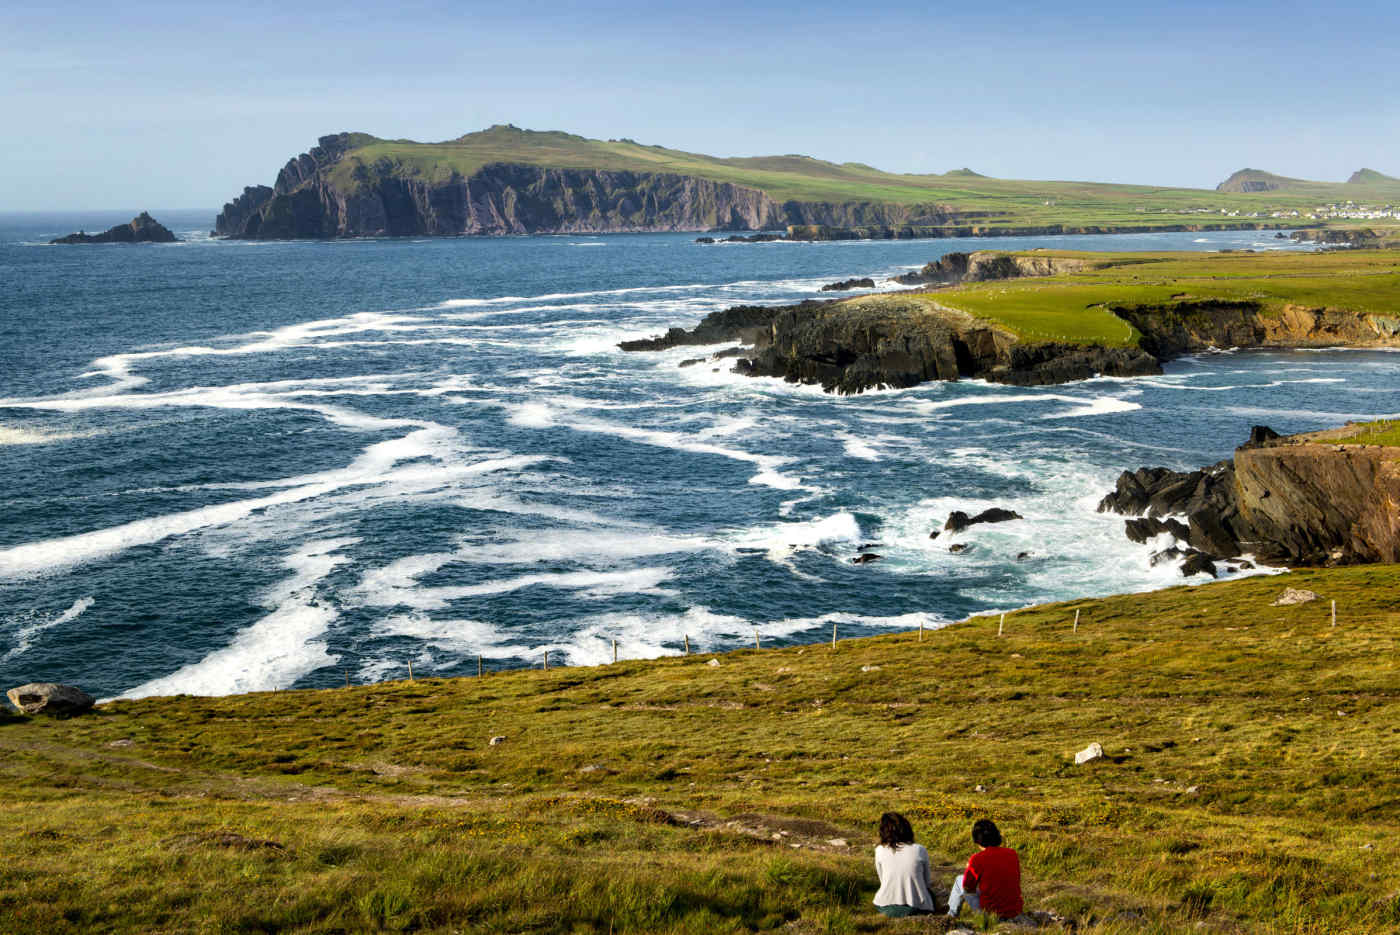 Blasket Islands in County Kerry, Ireland